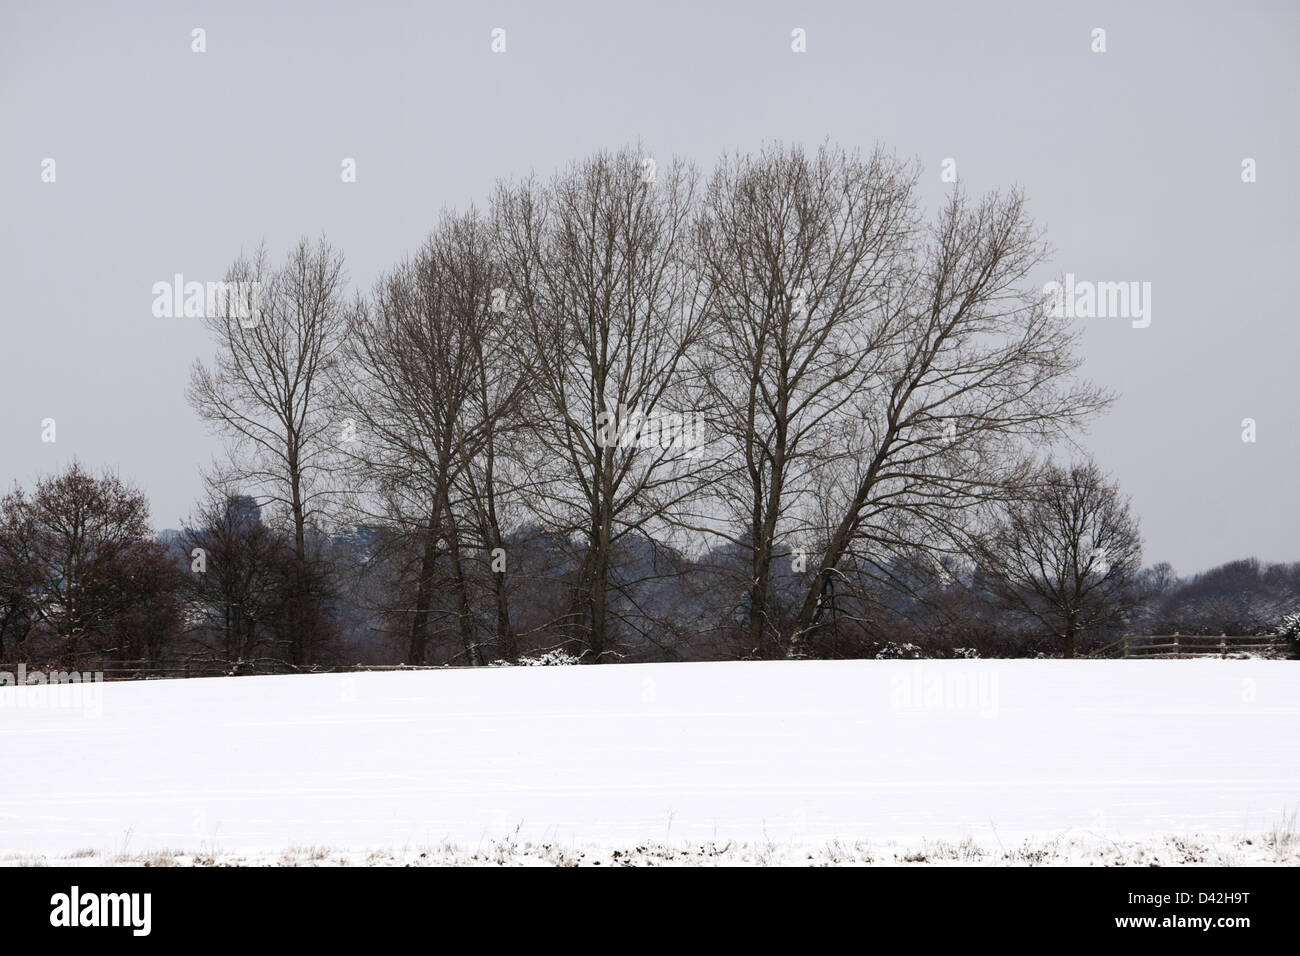 BISHOP'S STORTFORD HERTFORDSHIRE SNOW FIELD. UK. Stock Photo